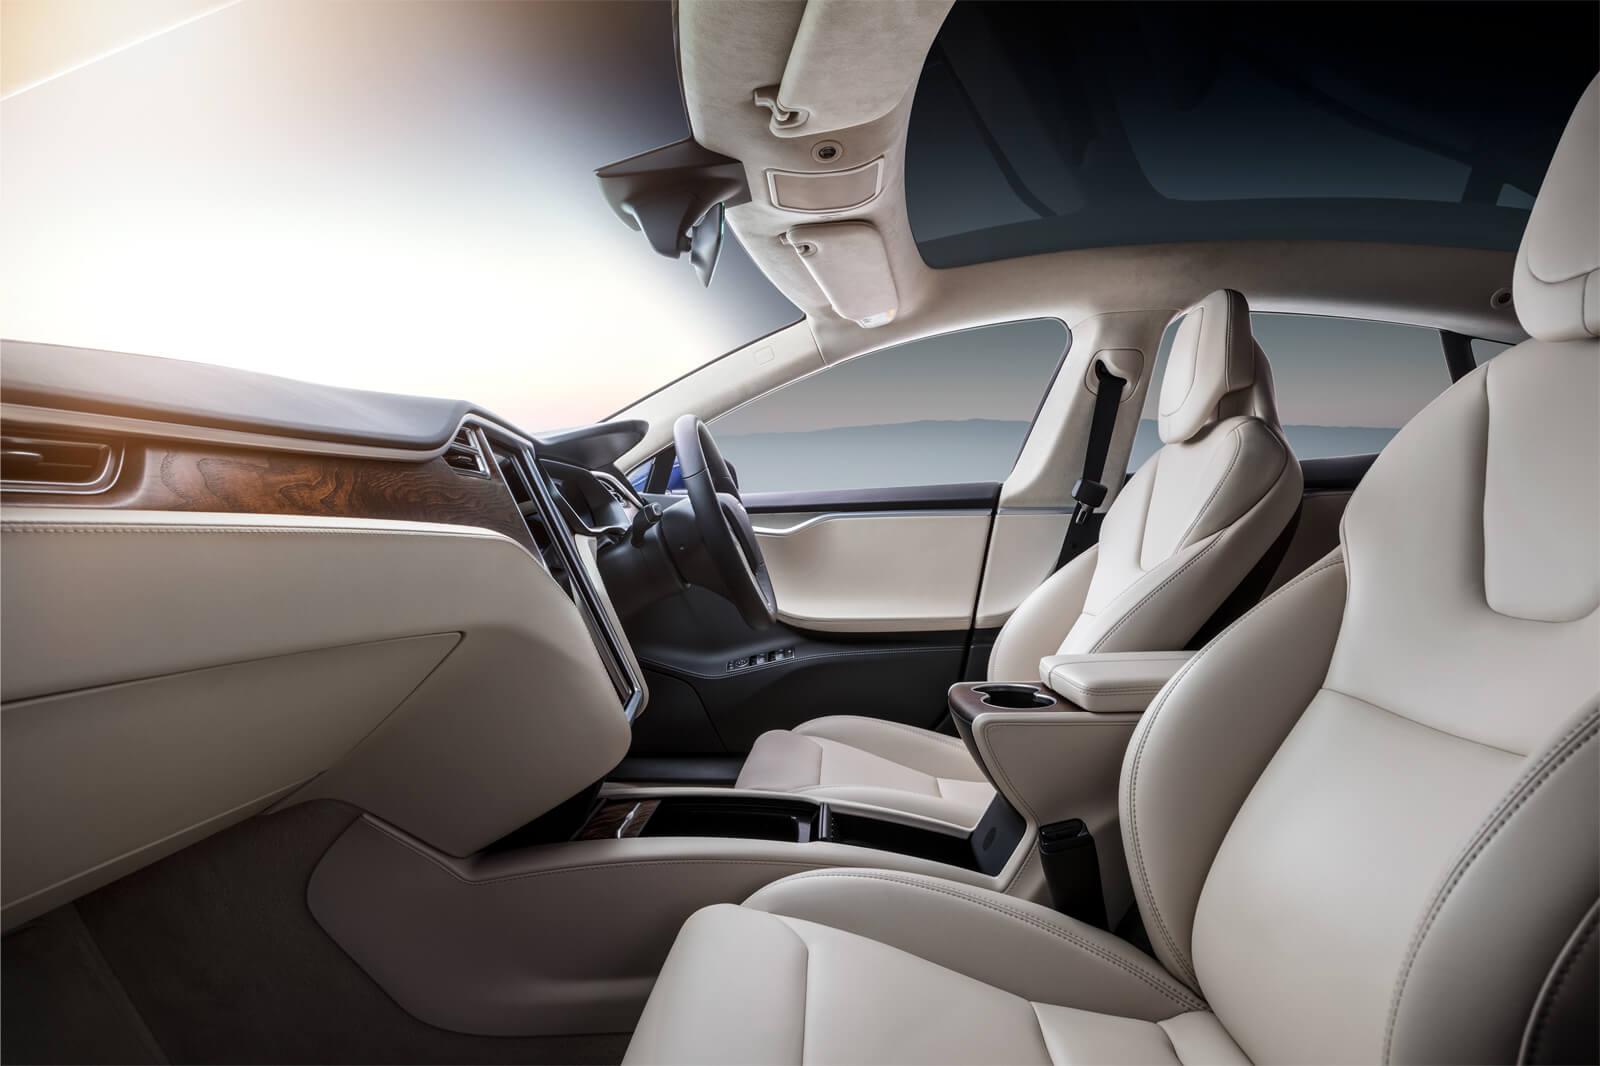 Tesla Model S Review > 2020 UK Price, Range, Specs, Videos